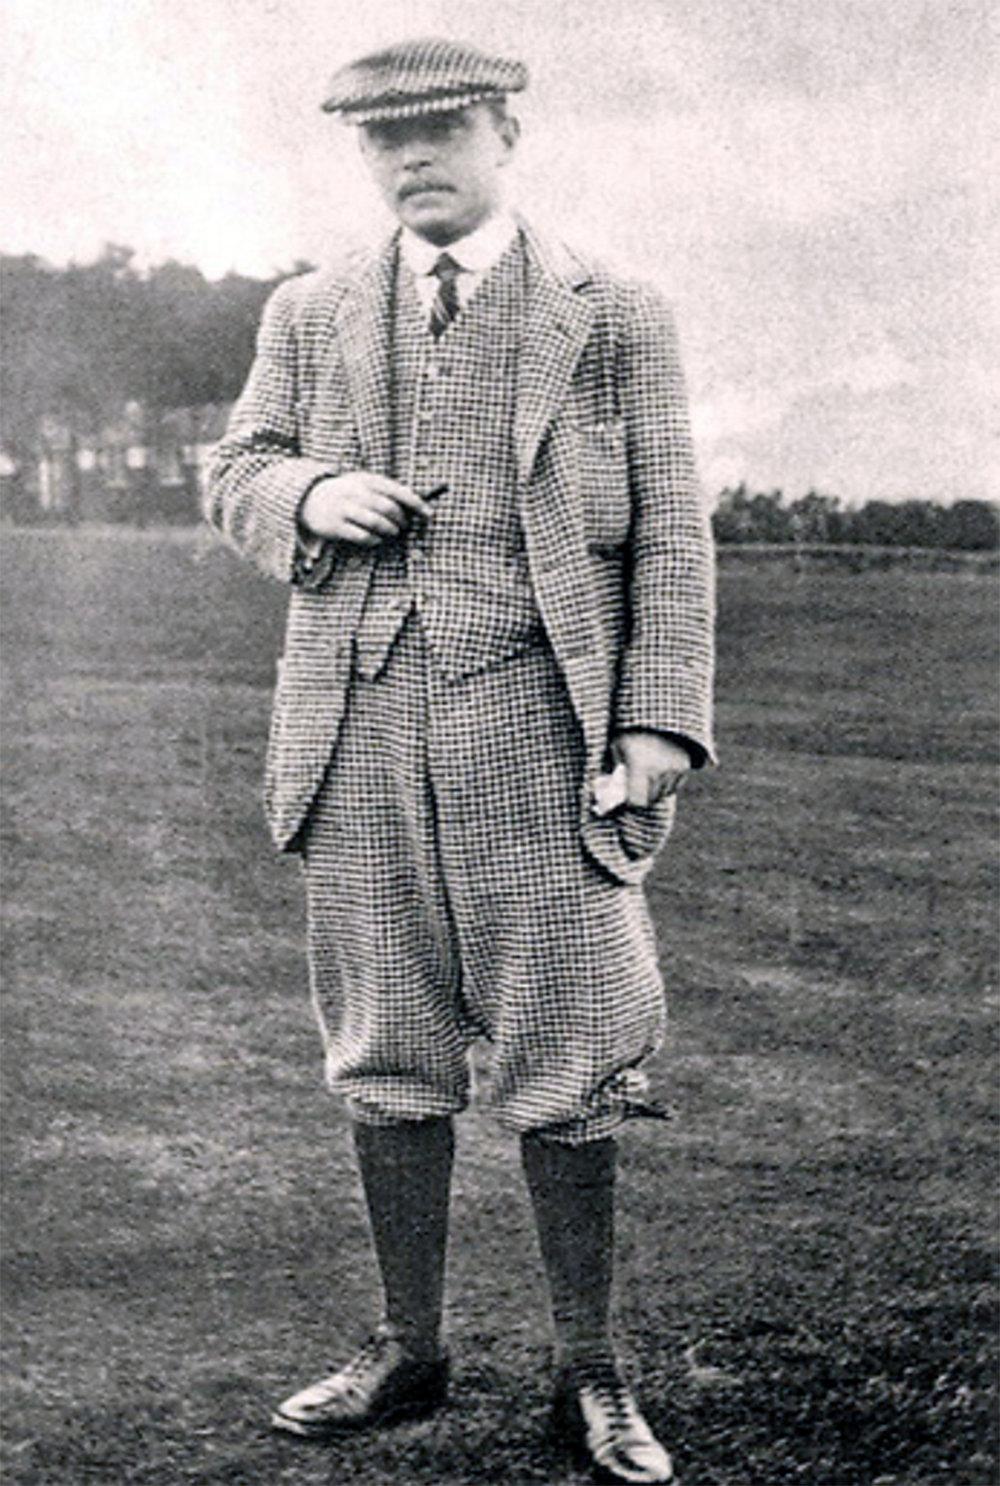 Harry S. Colt